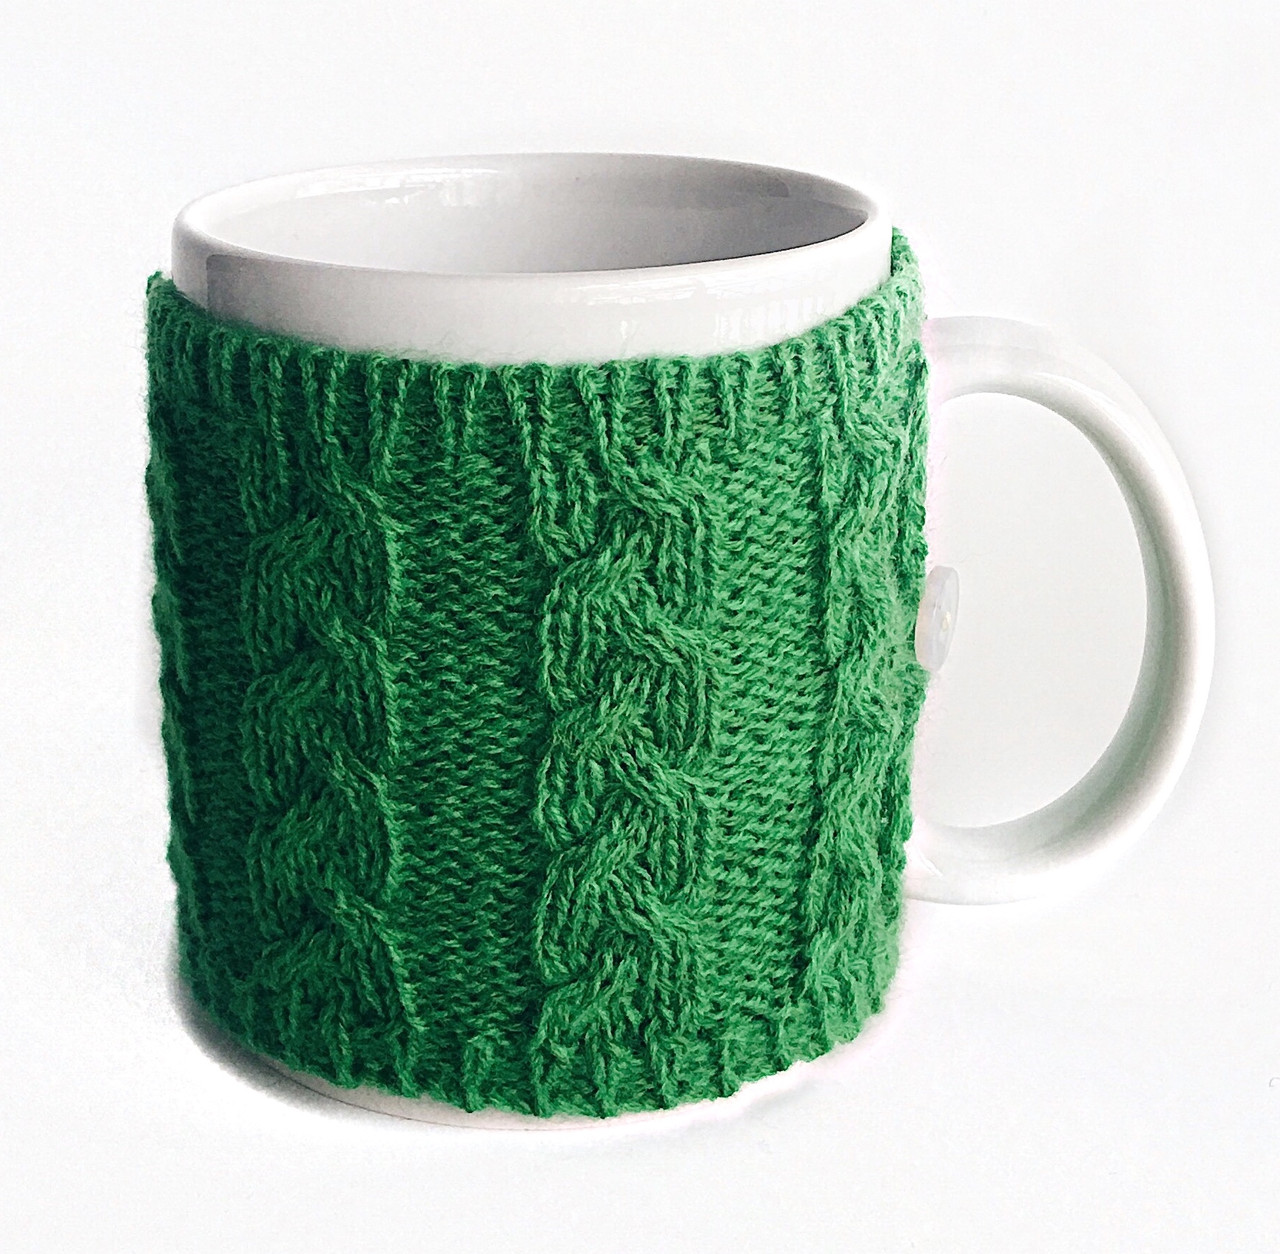 Вязаный чехол для чашки Ohaina цвет зеленый